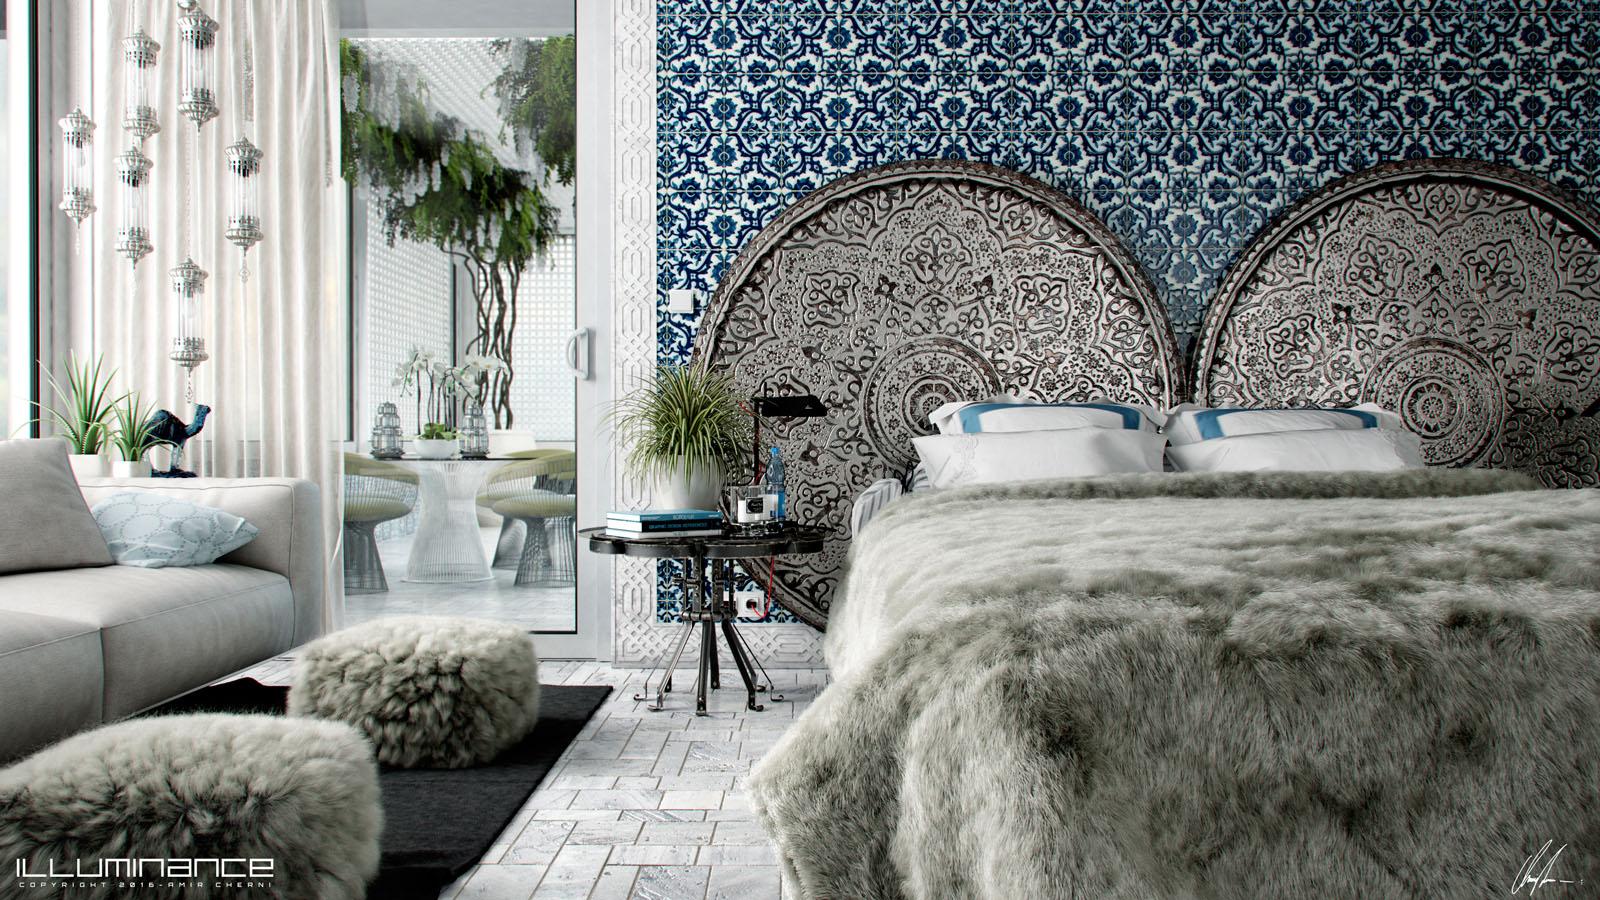 Vwartclub classical arabic design - Contemporary style interior design ...